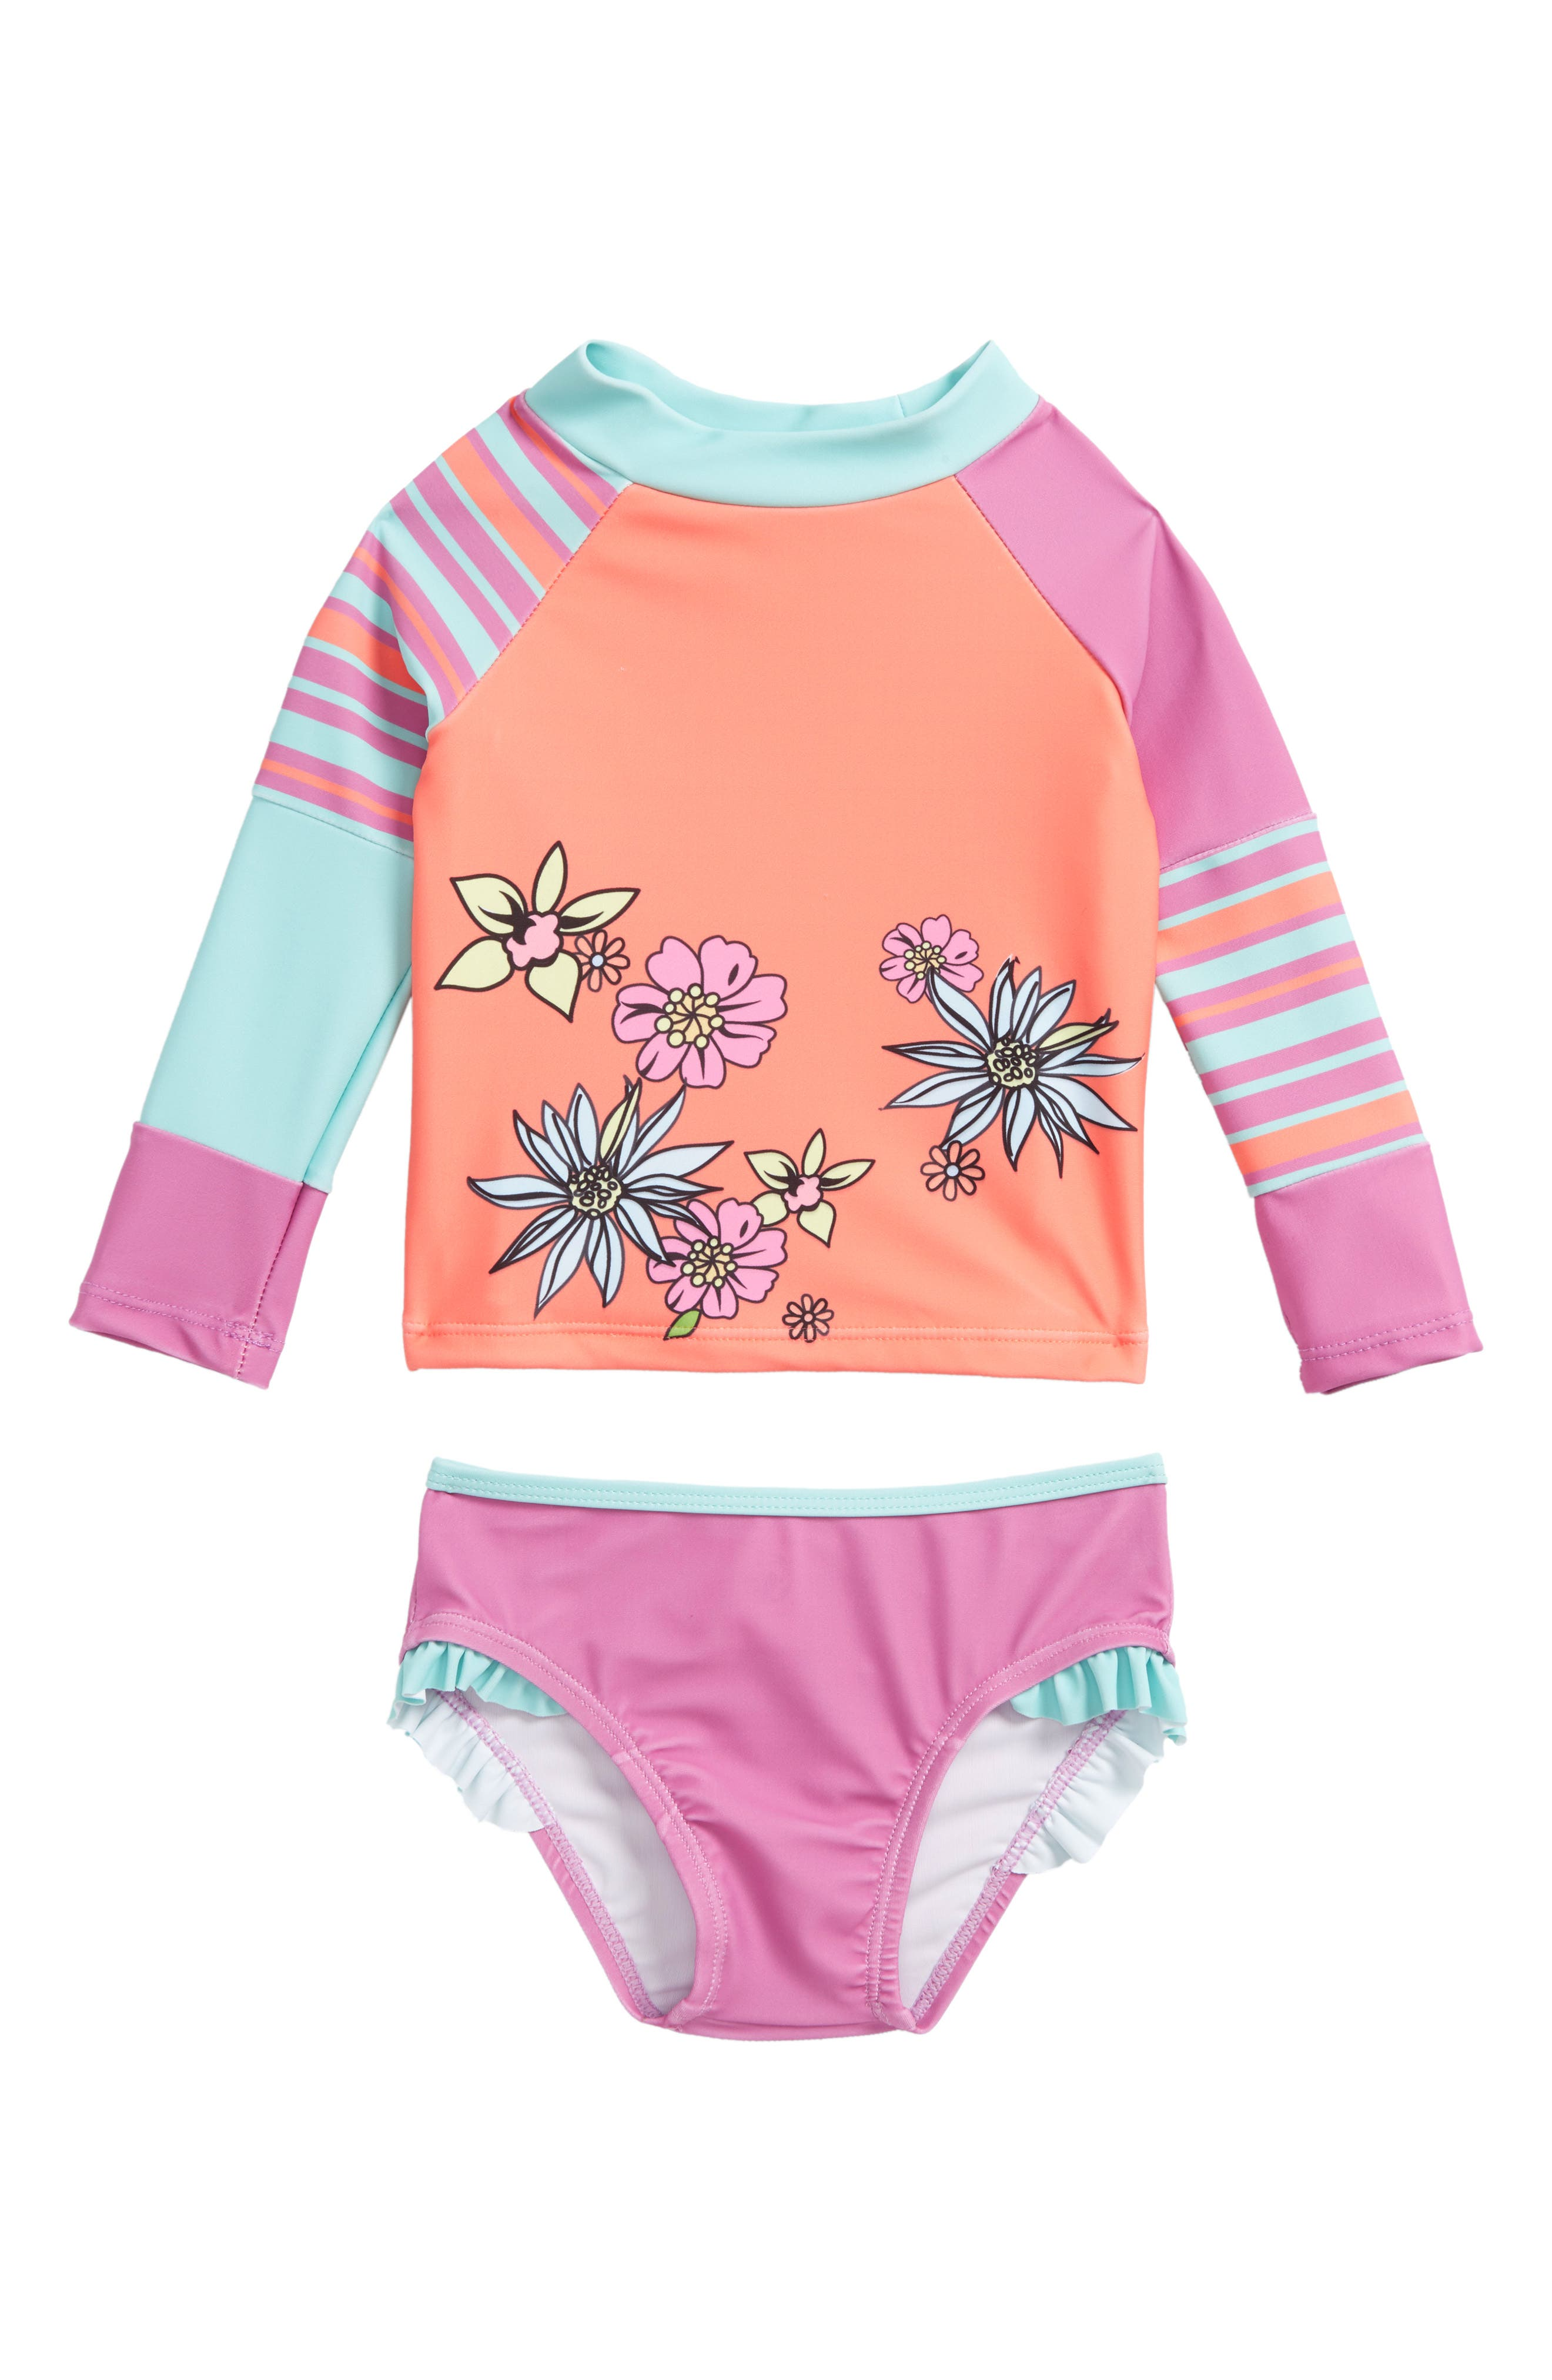 Two-Piece Rashguard Swimsuit,                             Main thumbnail 1, color,                             Orange